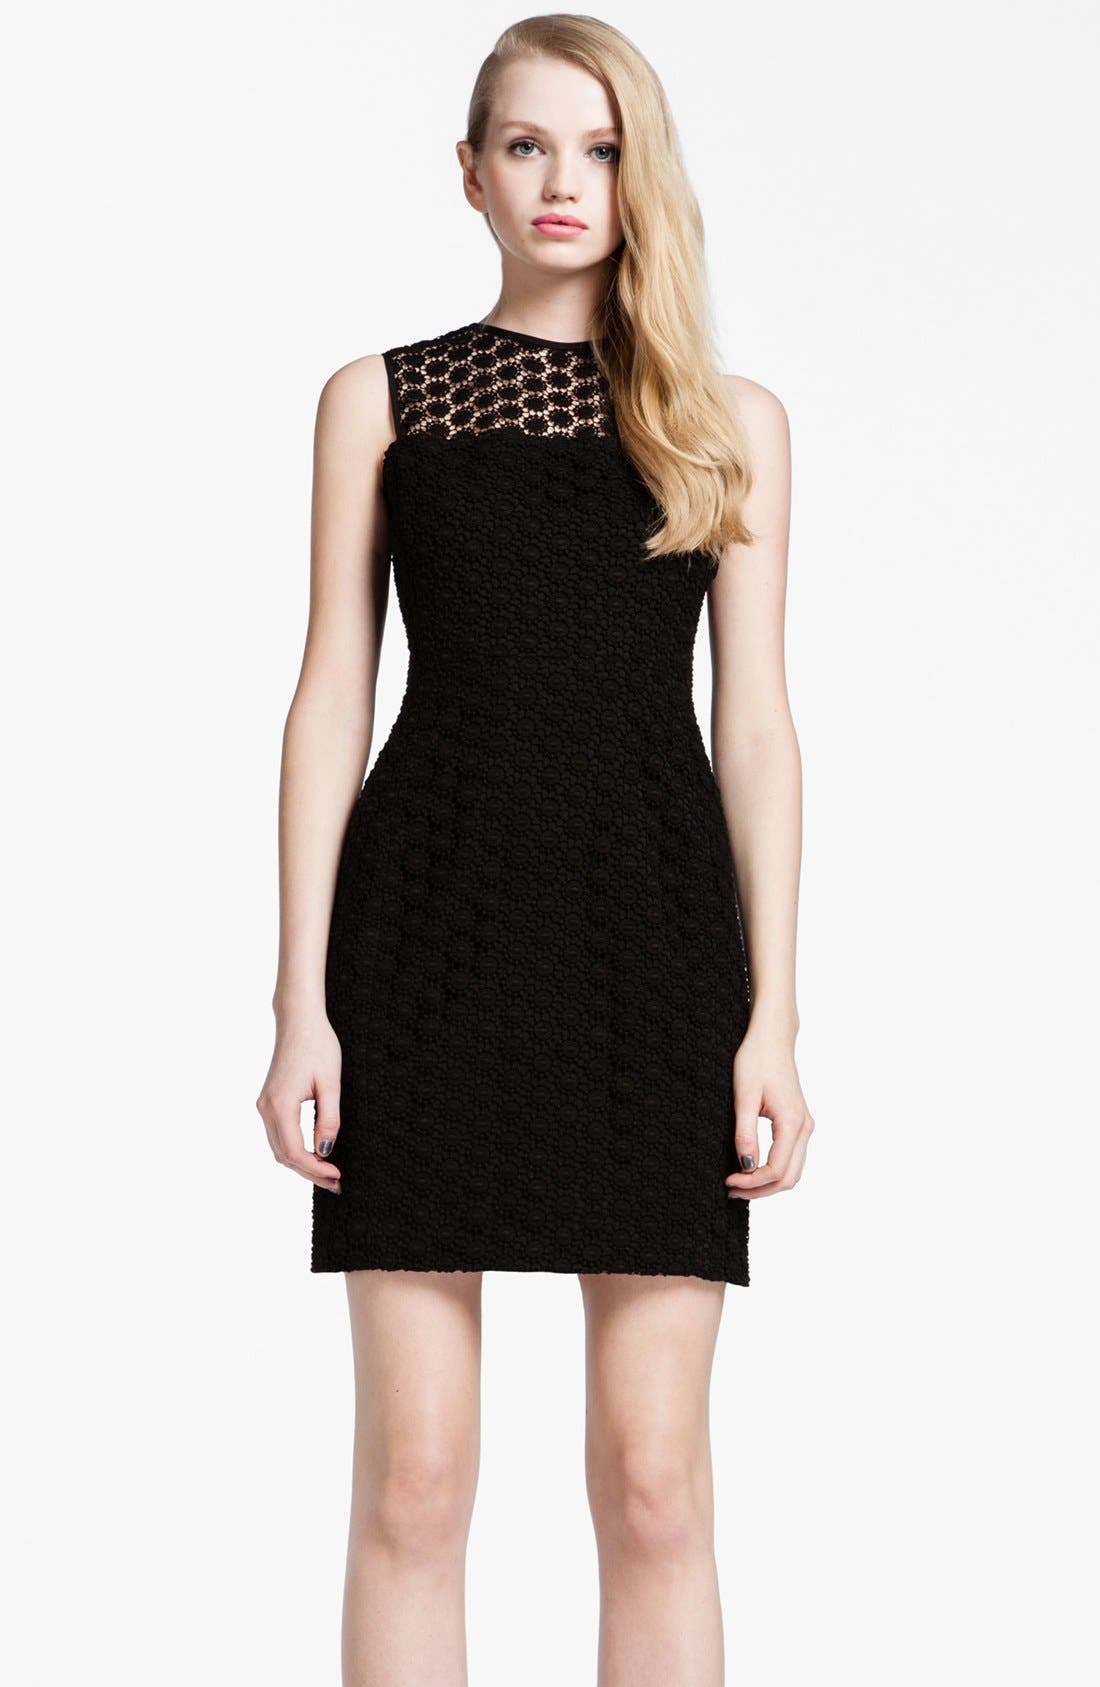 Alternate Image 1 Selected - Cynthia Steffe 'Olive' Crochet Lace Sheath Dress